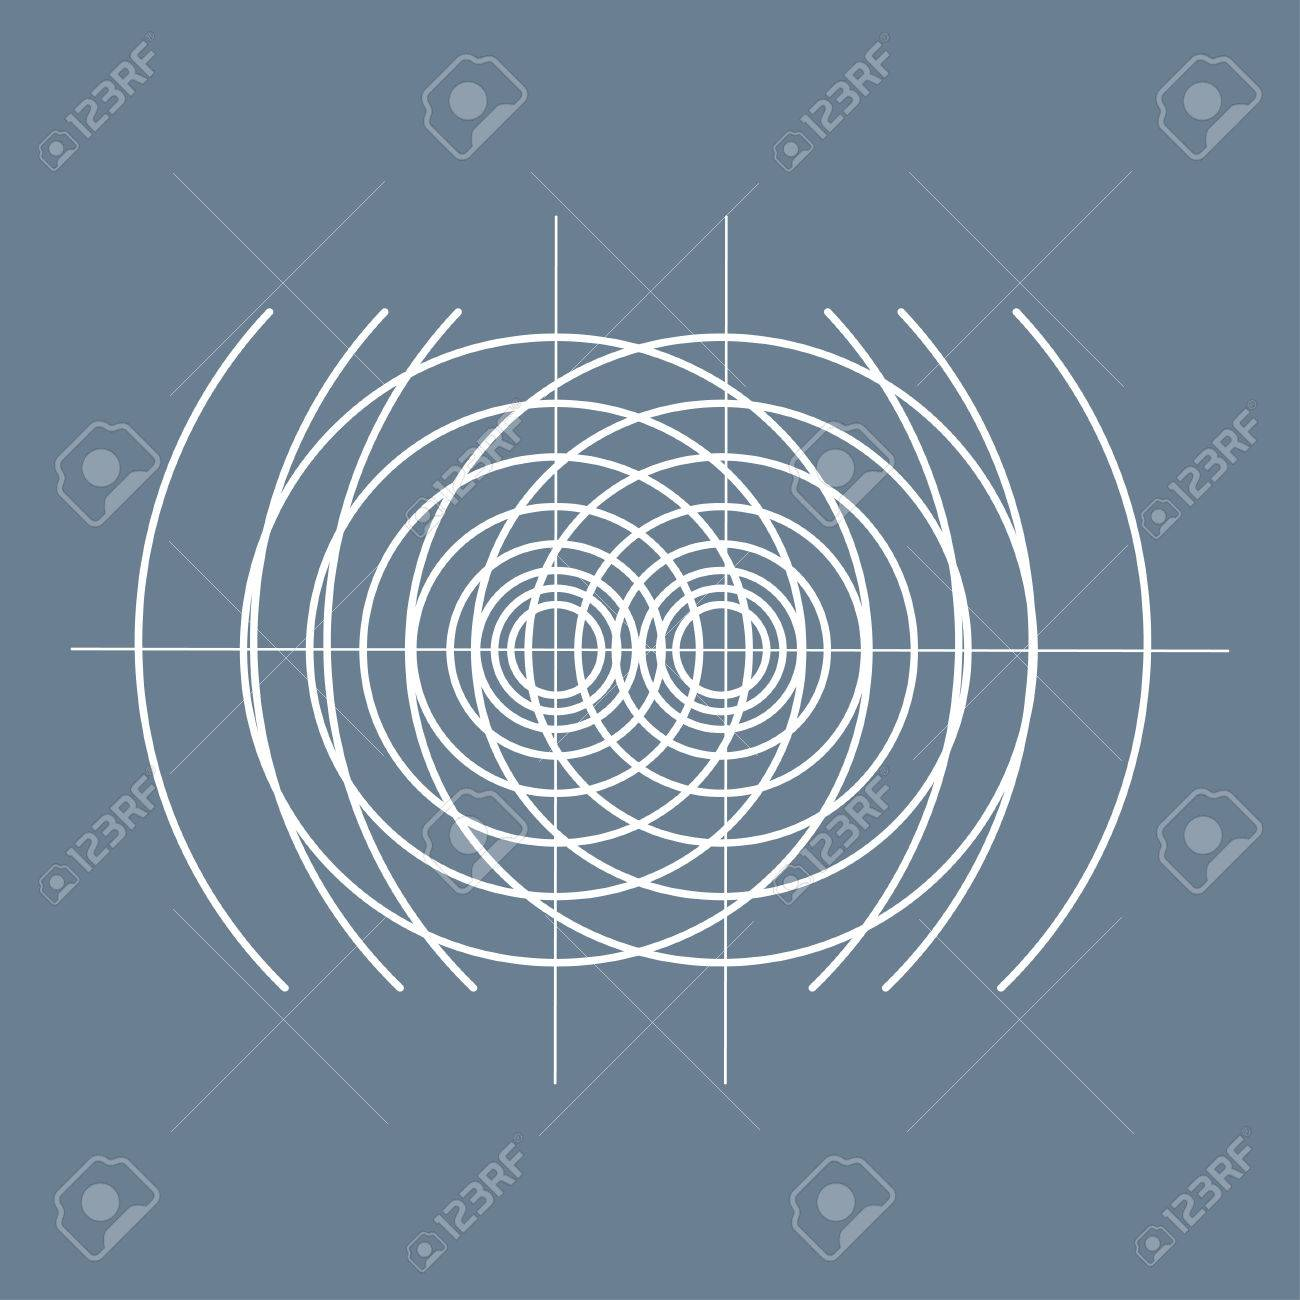 Sacred geometry symbol or element alchemy religion philosophy sacred geometry symbol or element alchemy religion philosophy astrology and spirituality themes biocorpaavc